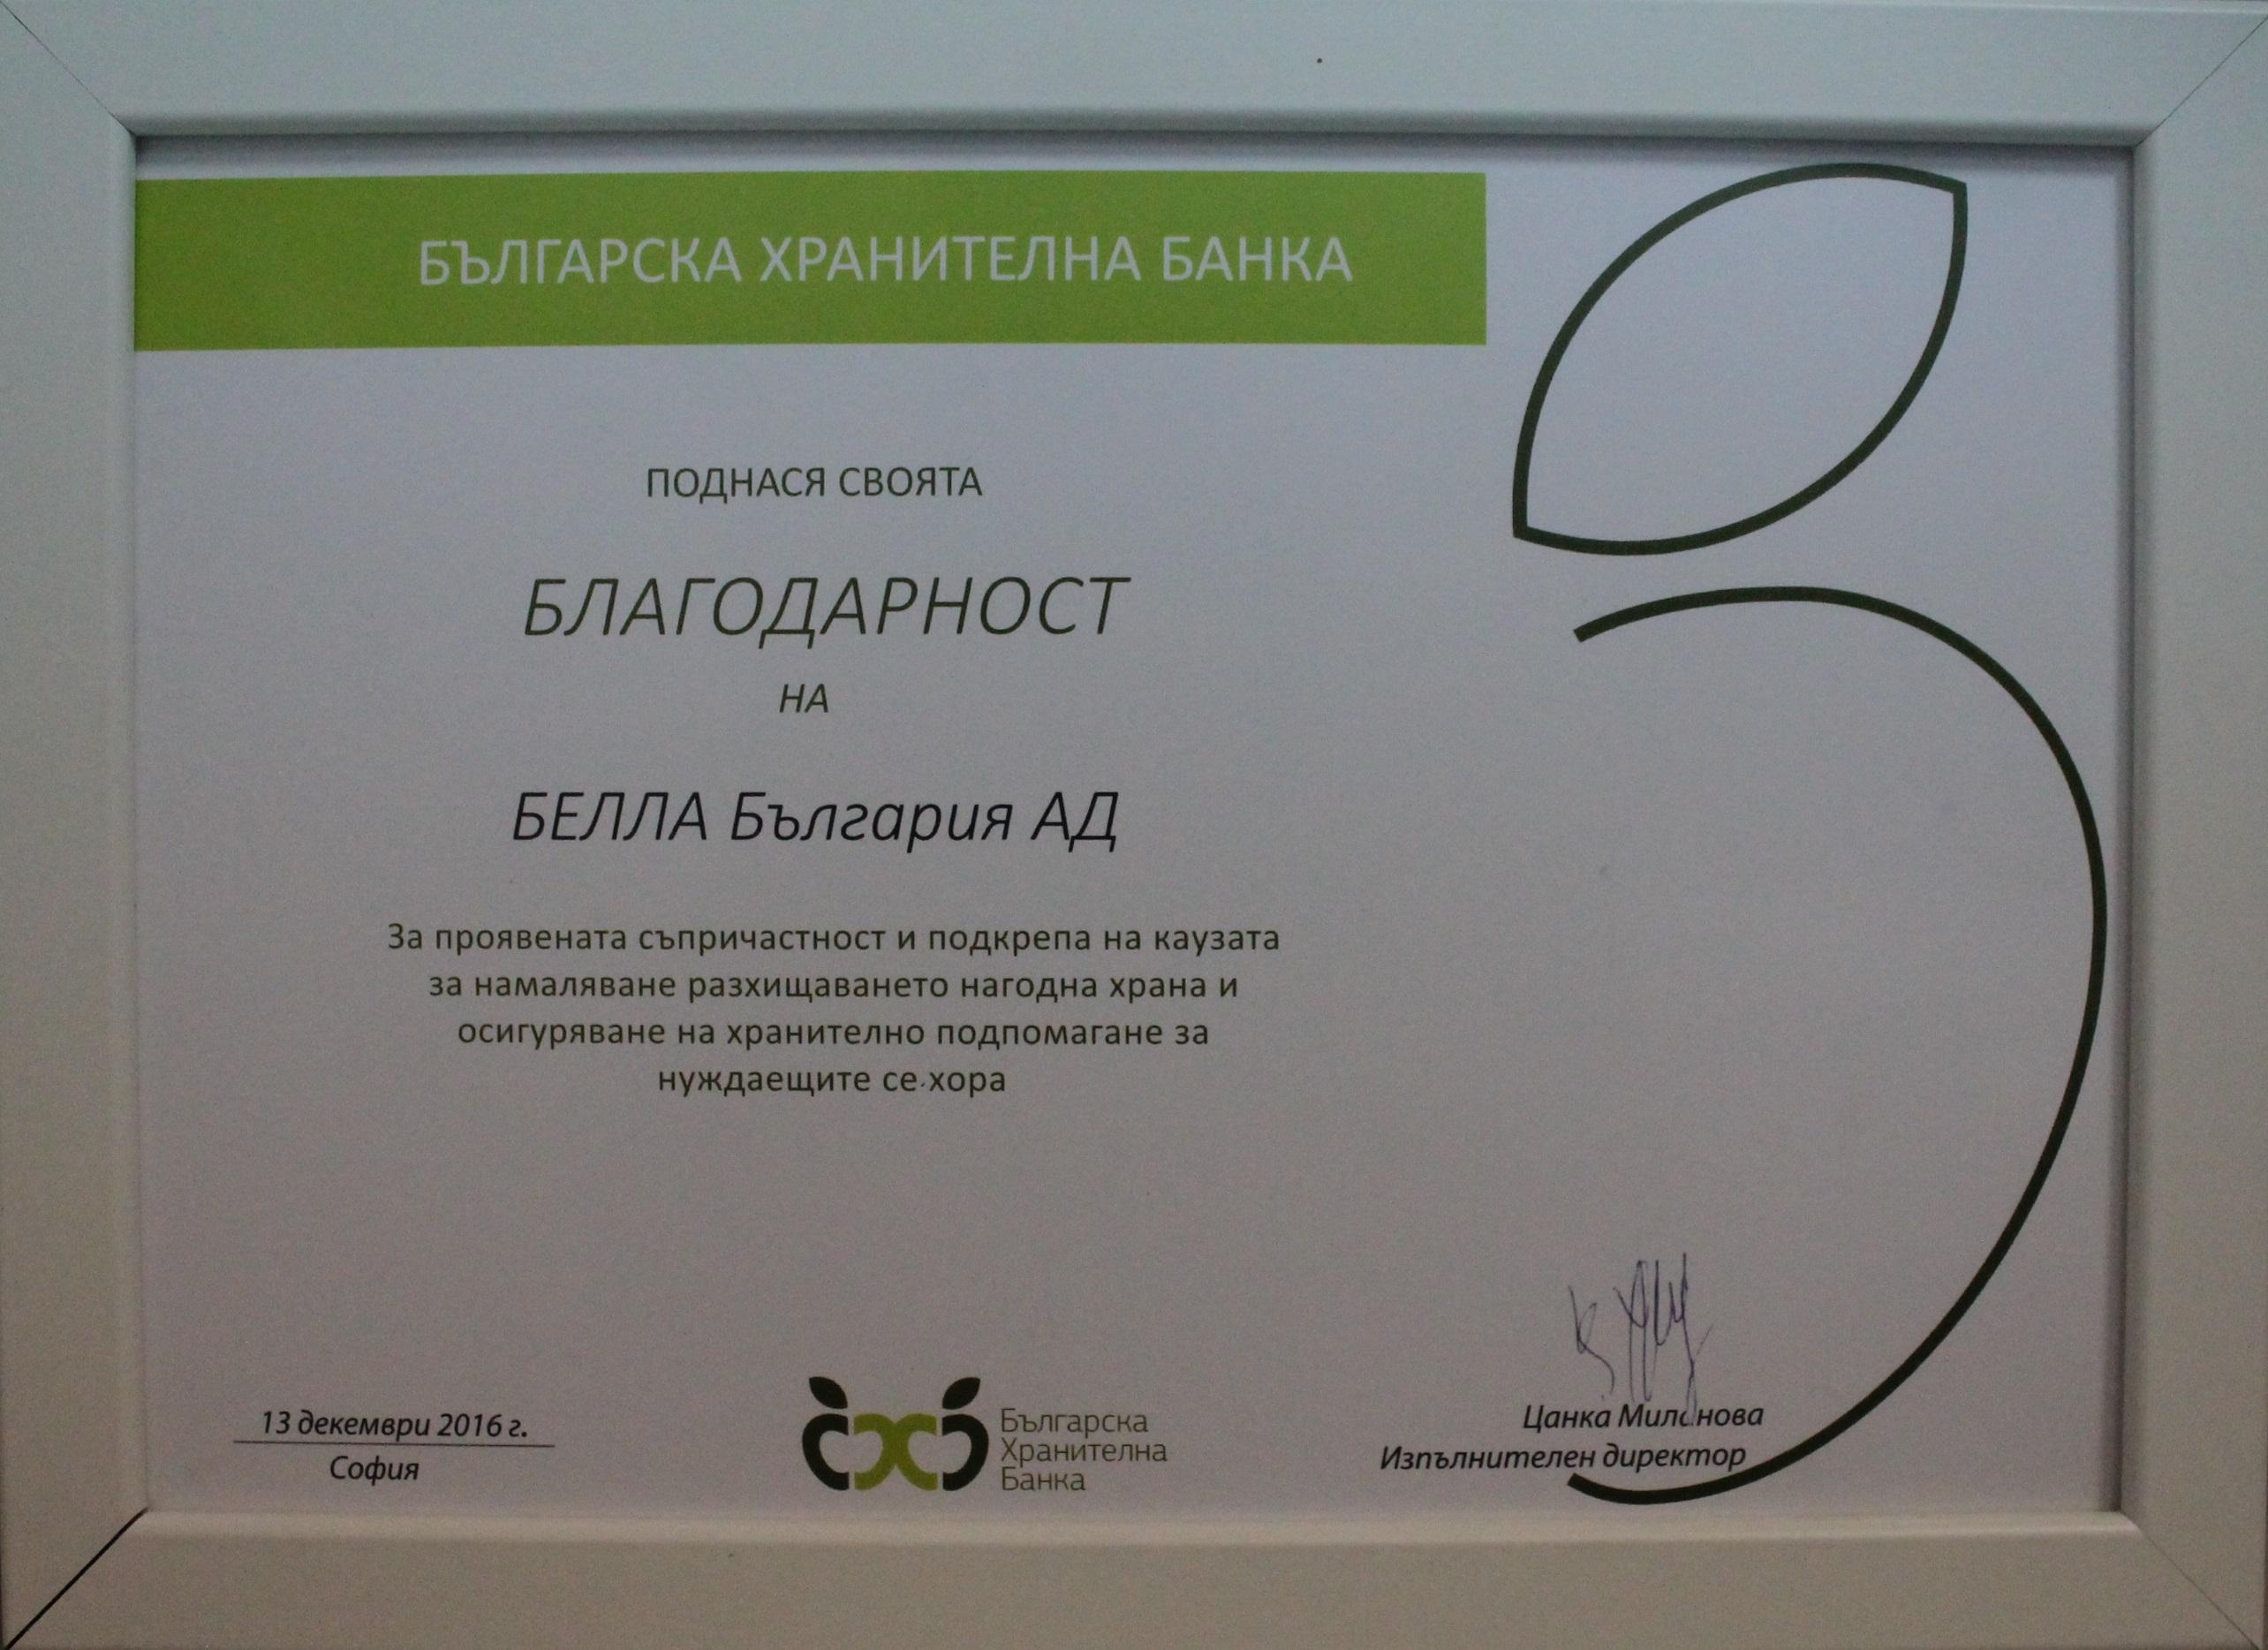 Bulgarian Food Bank Thankful diploma